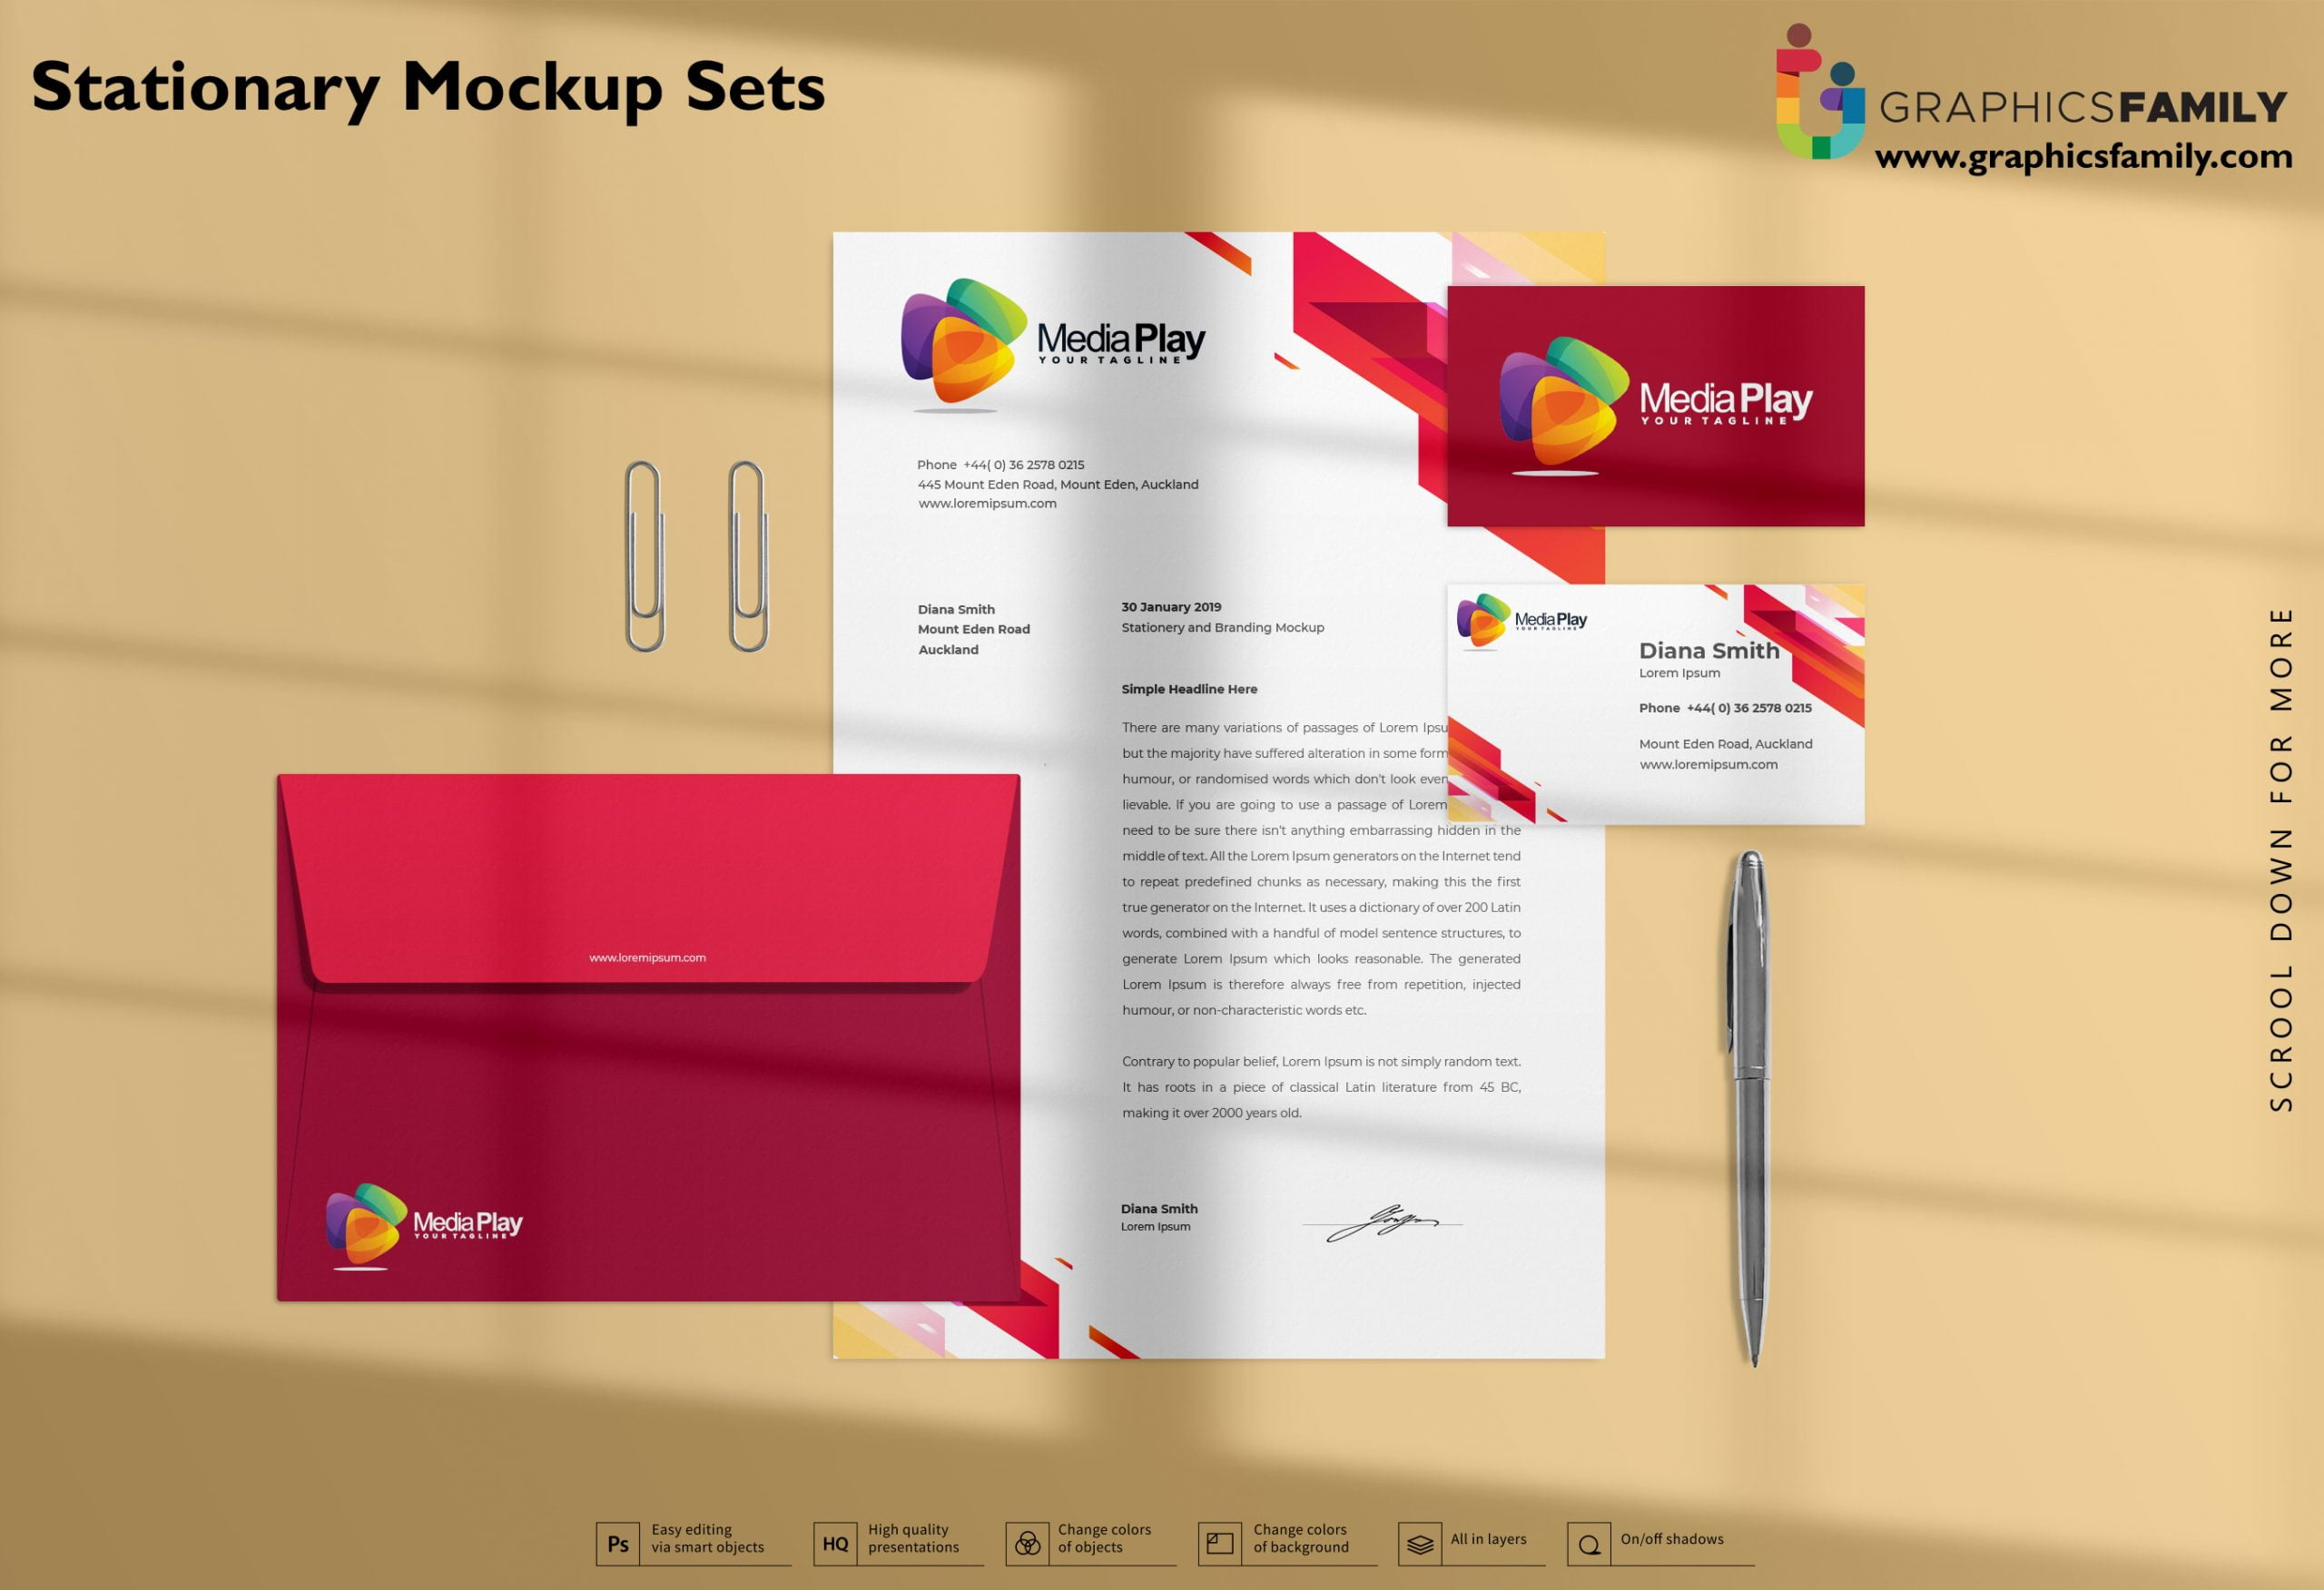 Stationery Mockup Sets Free PSD Download